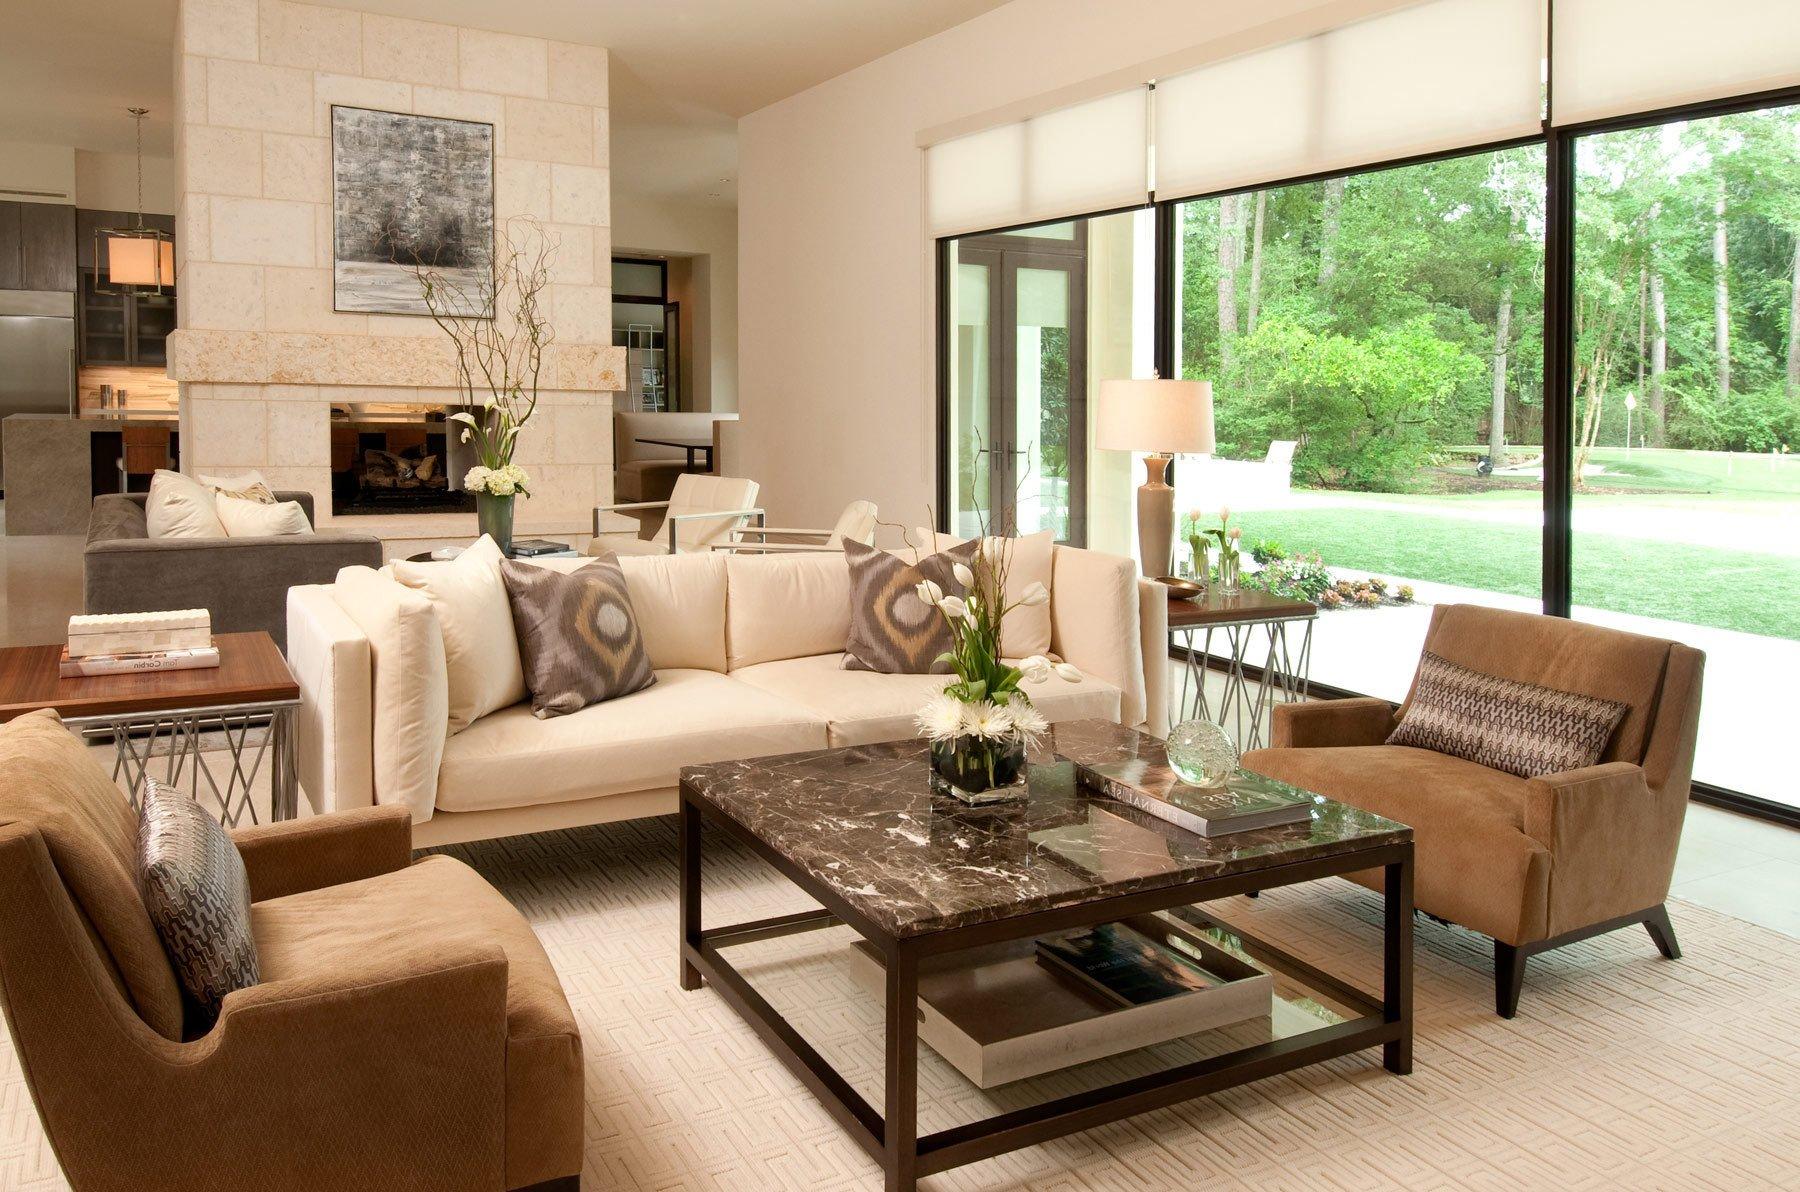 Comfortable Living Room Minimalist 27 fortable Living Room Design Ideas Decoration Love